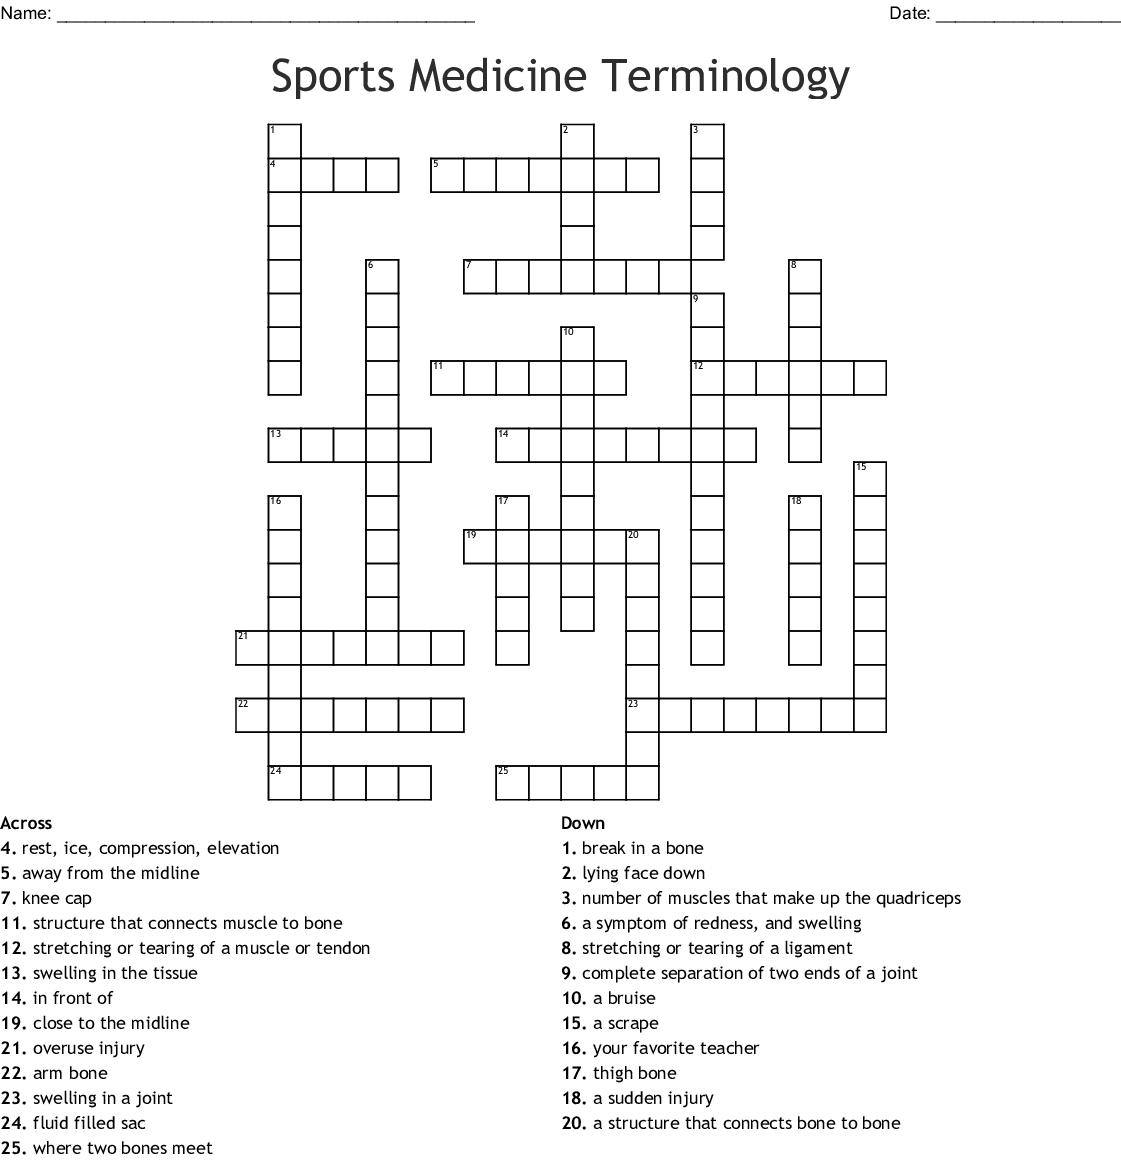 Sports Medicine Terminology Crossword